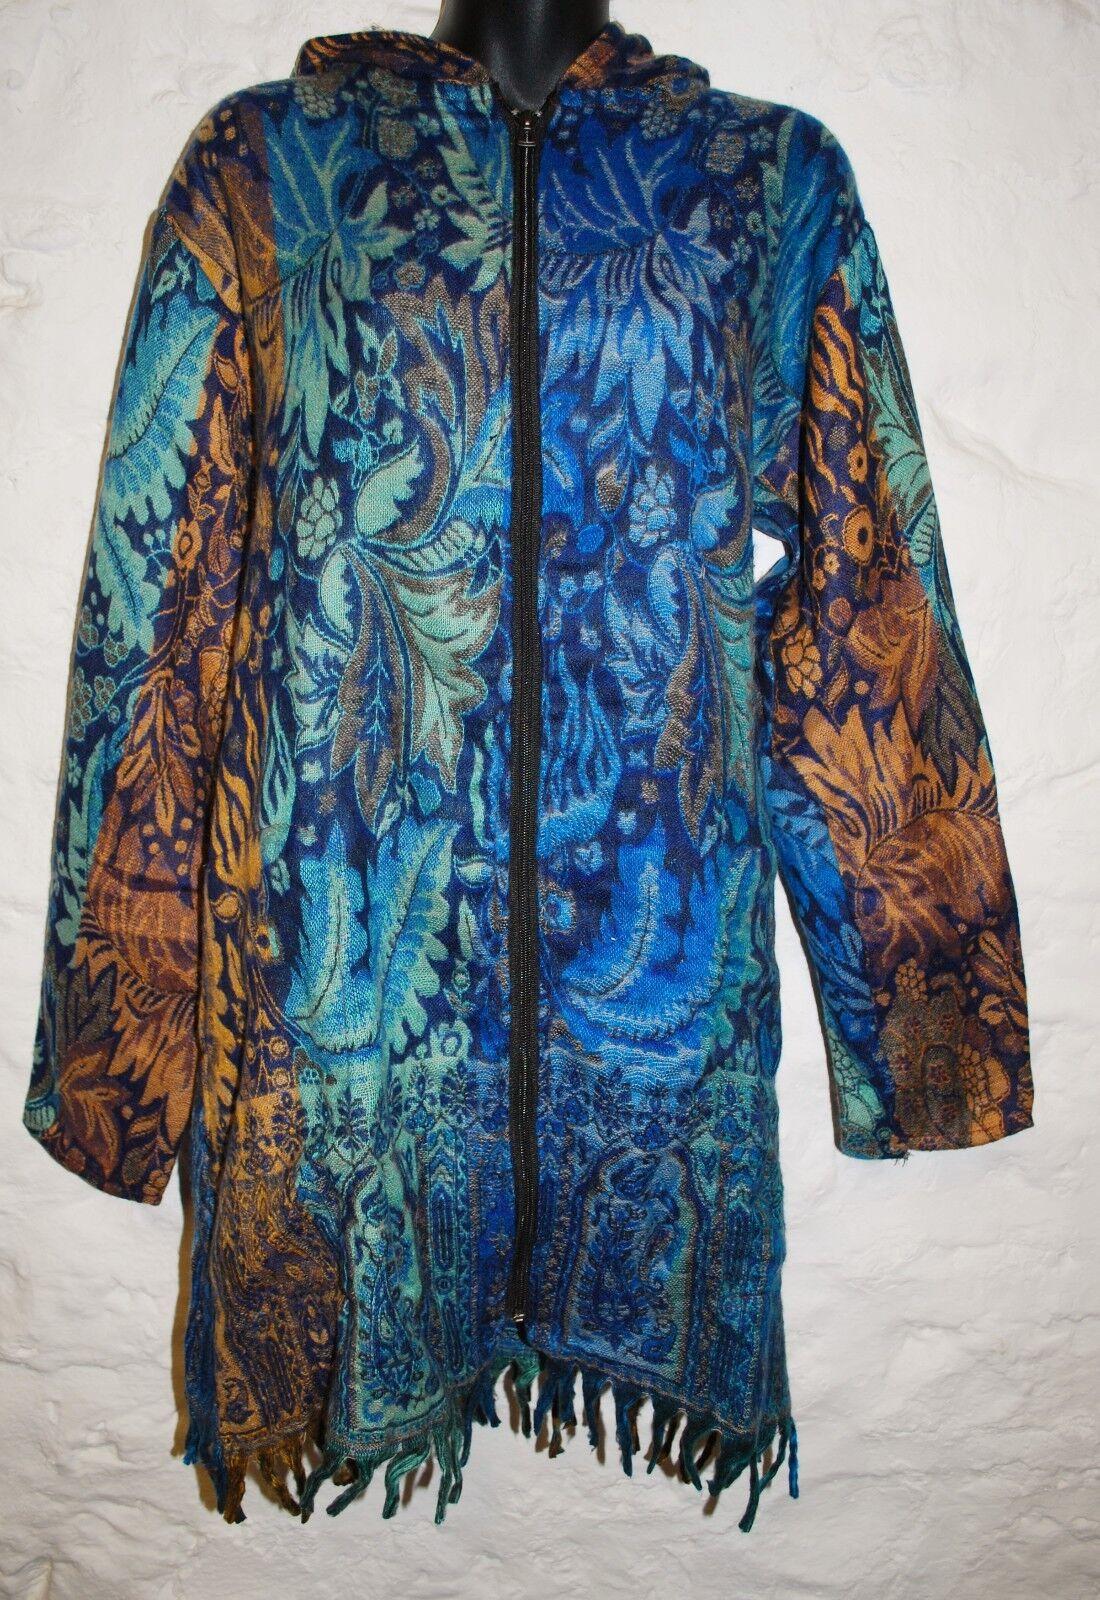 16 Long Traded 14 Fairly Hippy Ethnic India Acrylic Fleece Coat 7b6fgYyv